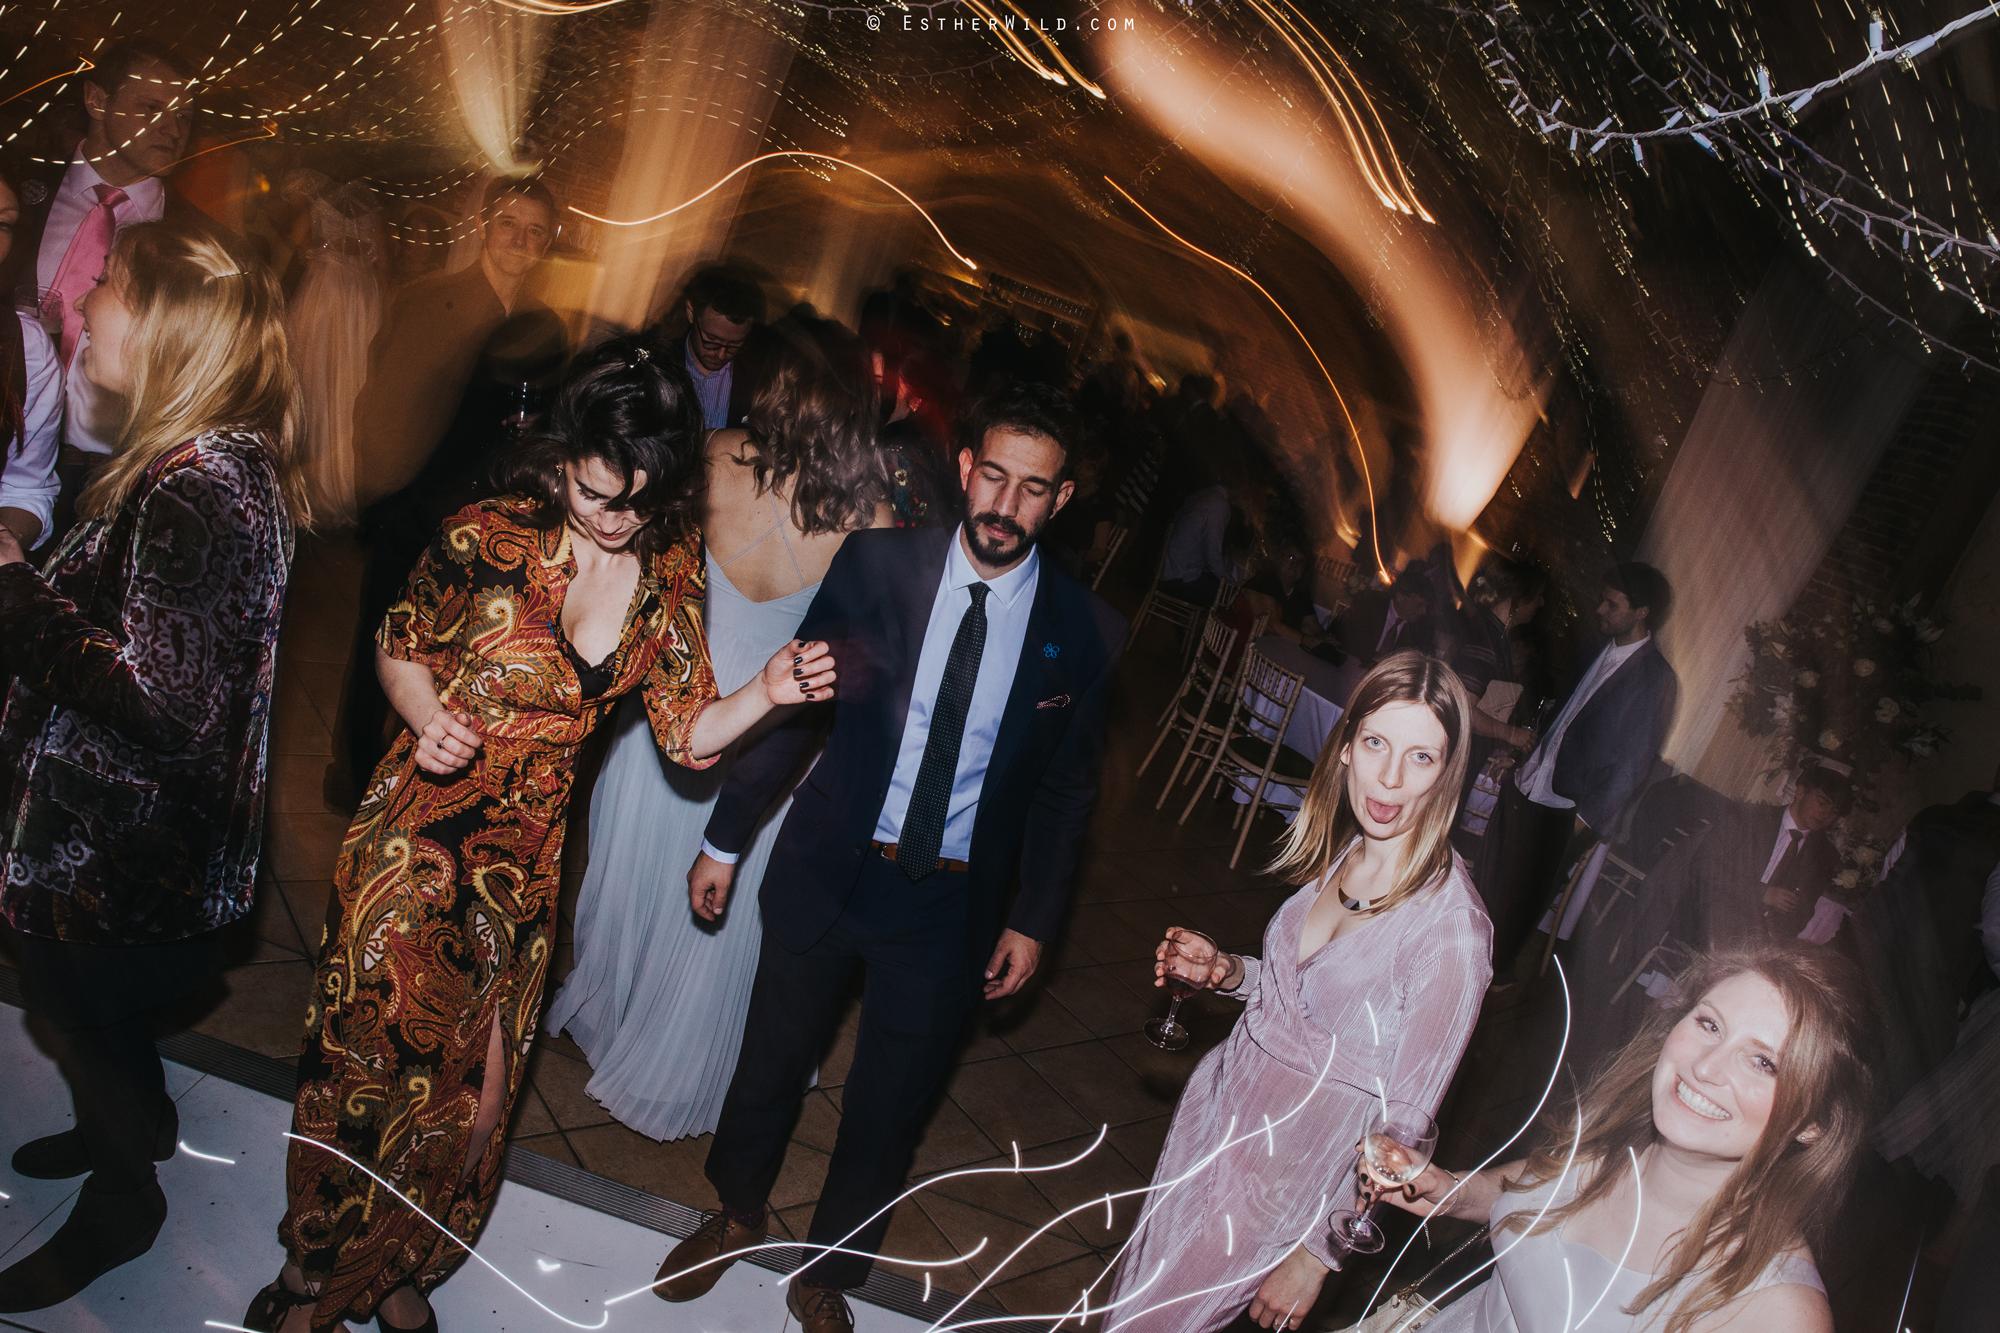 Elms_Barn_Weddings_Suffolk_Photographer_Copyright_Esther_Wild_IMG_3680.jpg